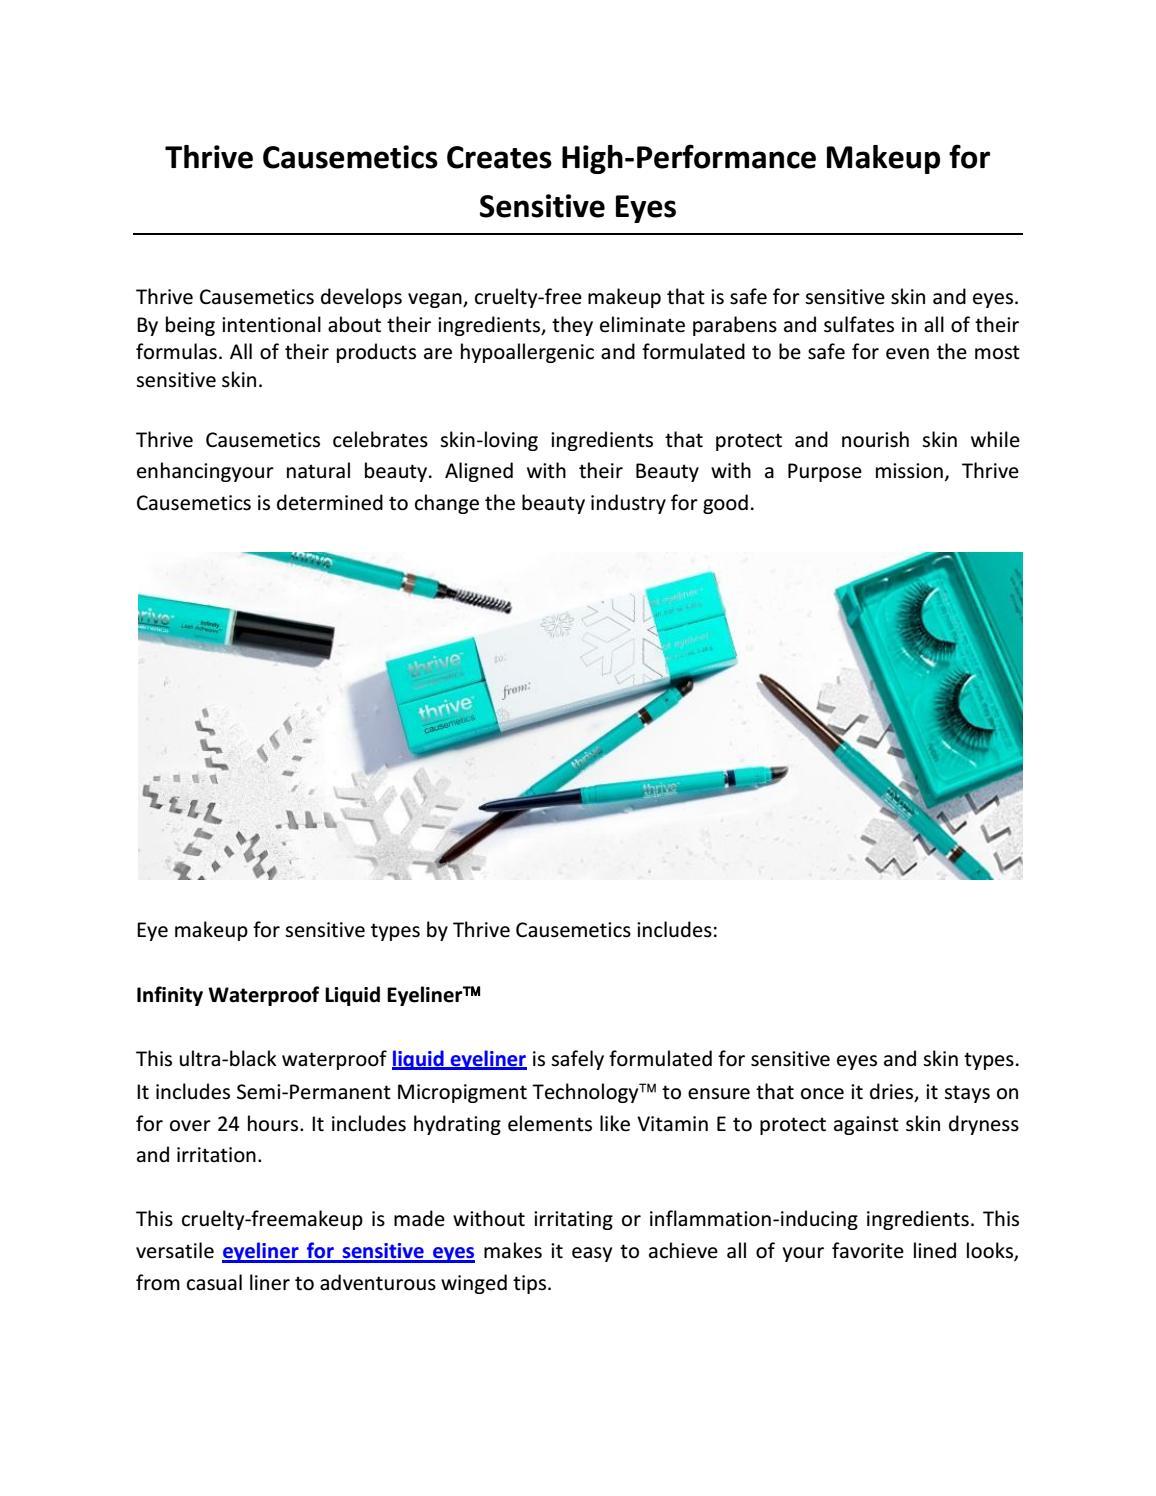 Thrive Causemetics Creates High Performance Makeup For Sensitive